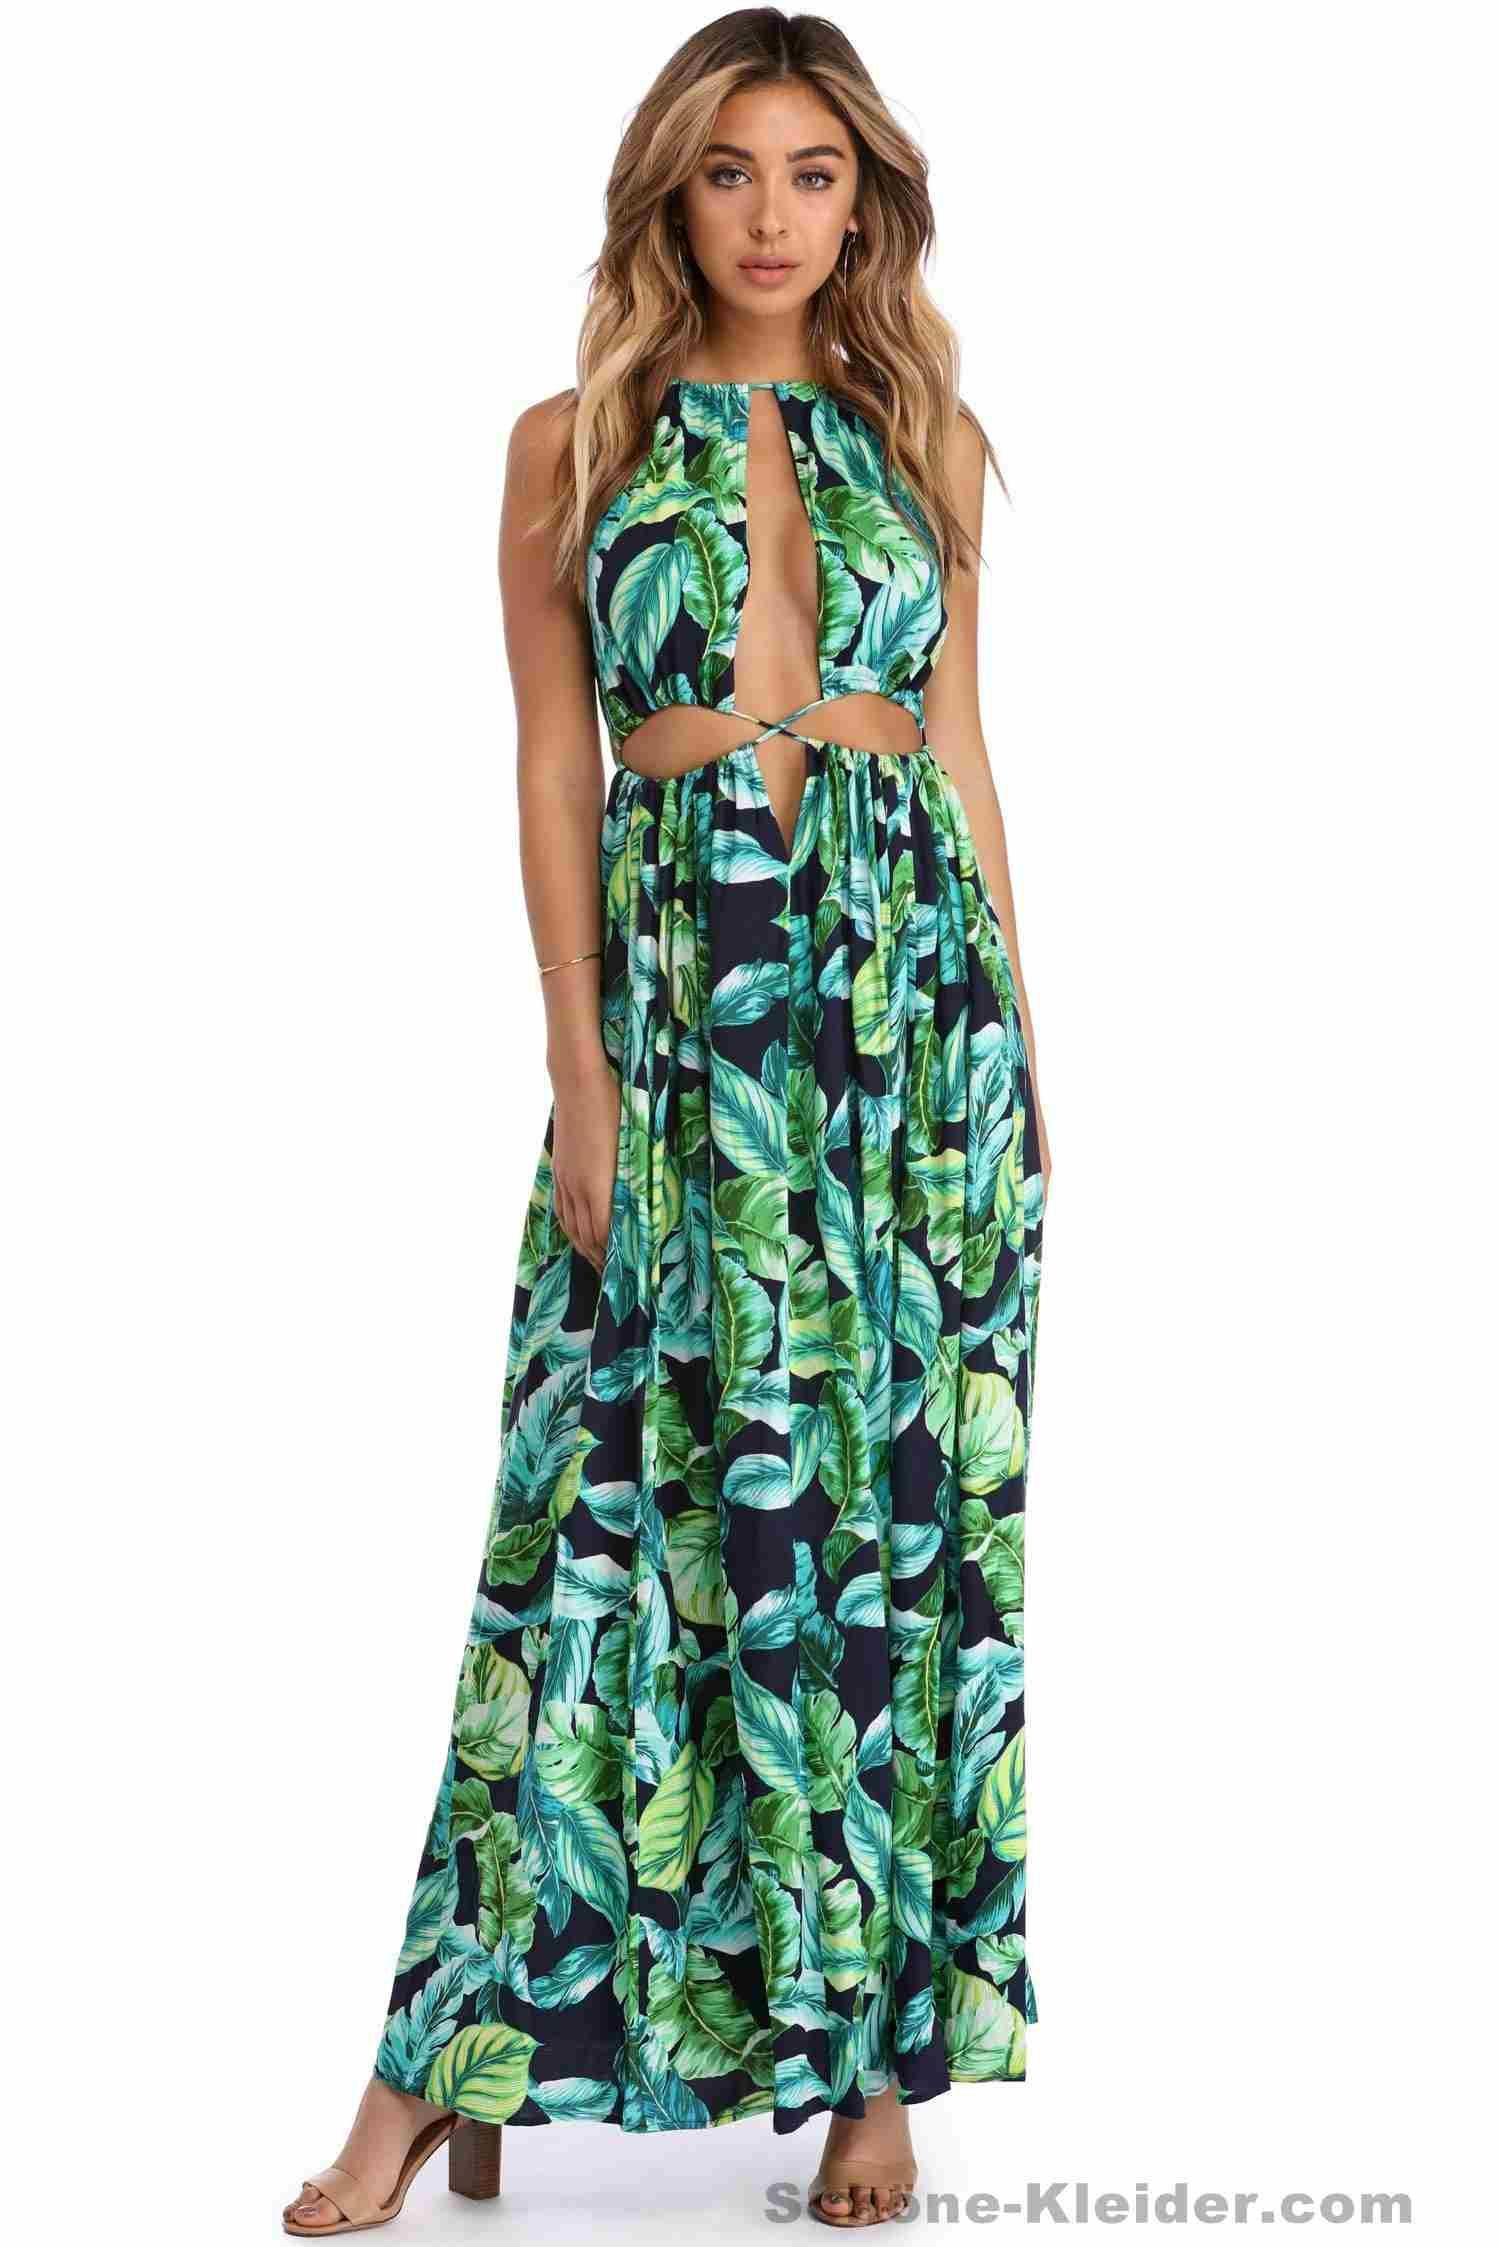 10 Cool Sommerkleider Elegant SpezialgebietFormal Luxus Sommerkleider Elegant Stylish